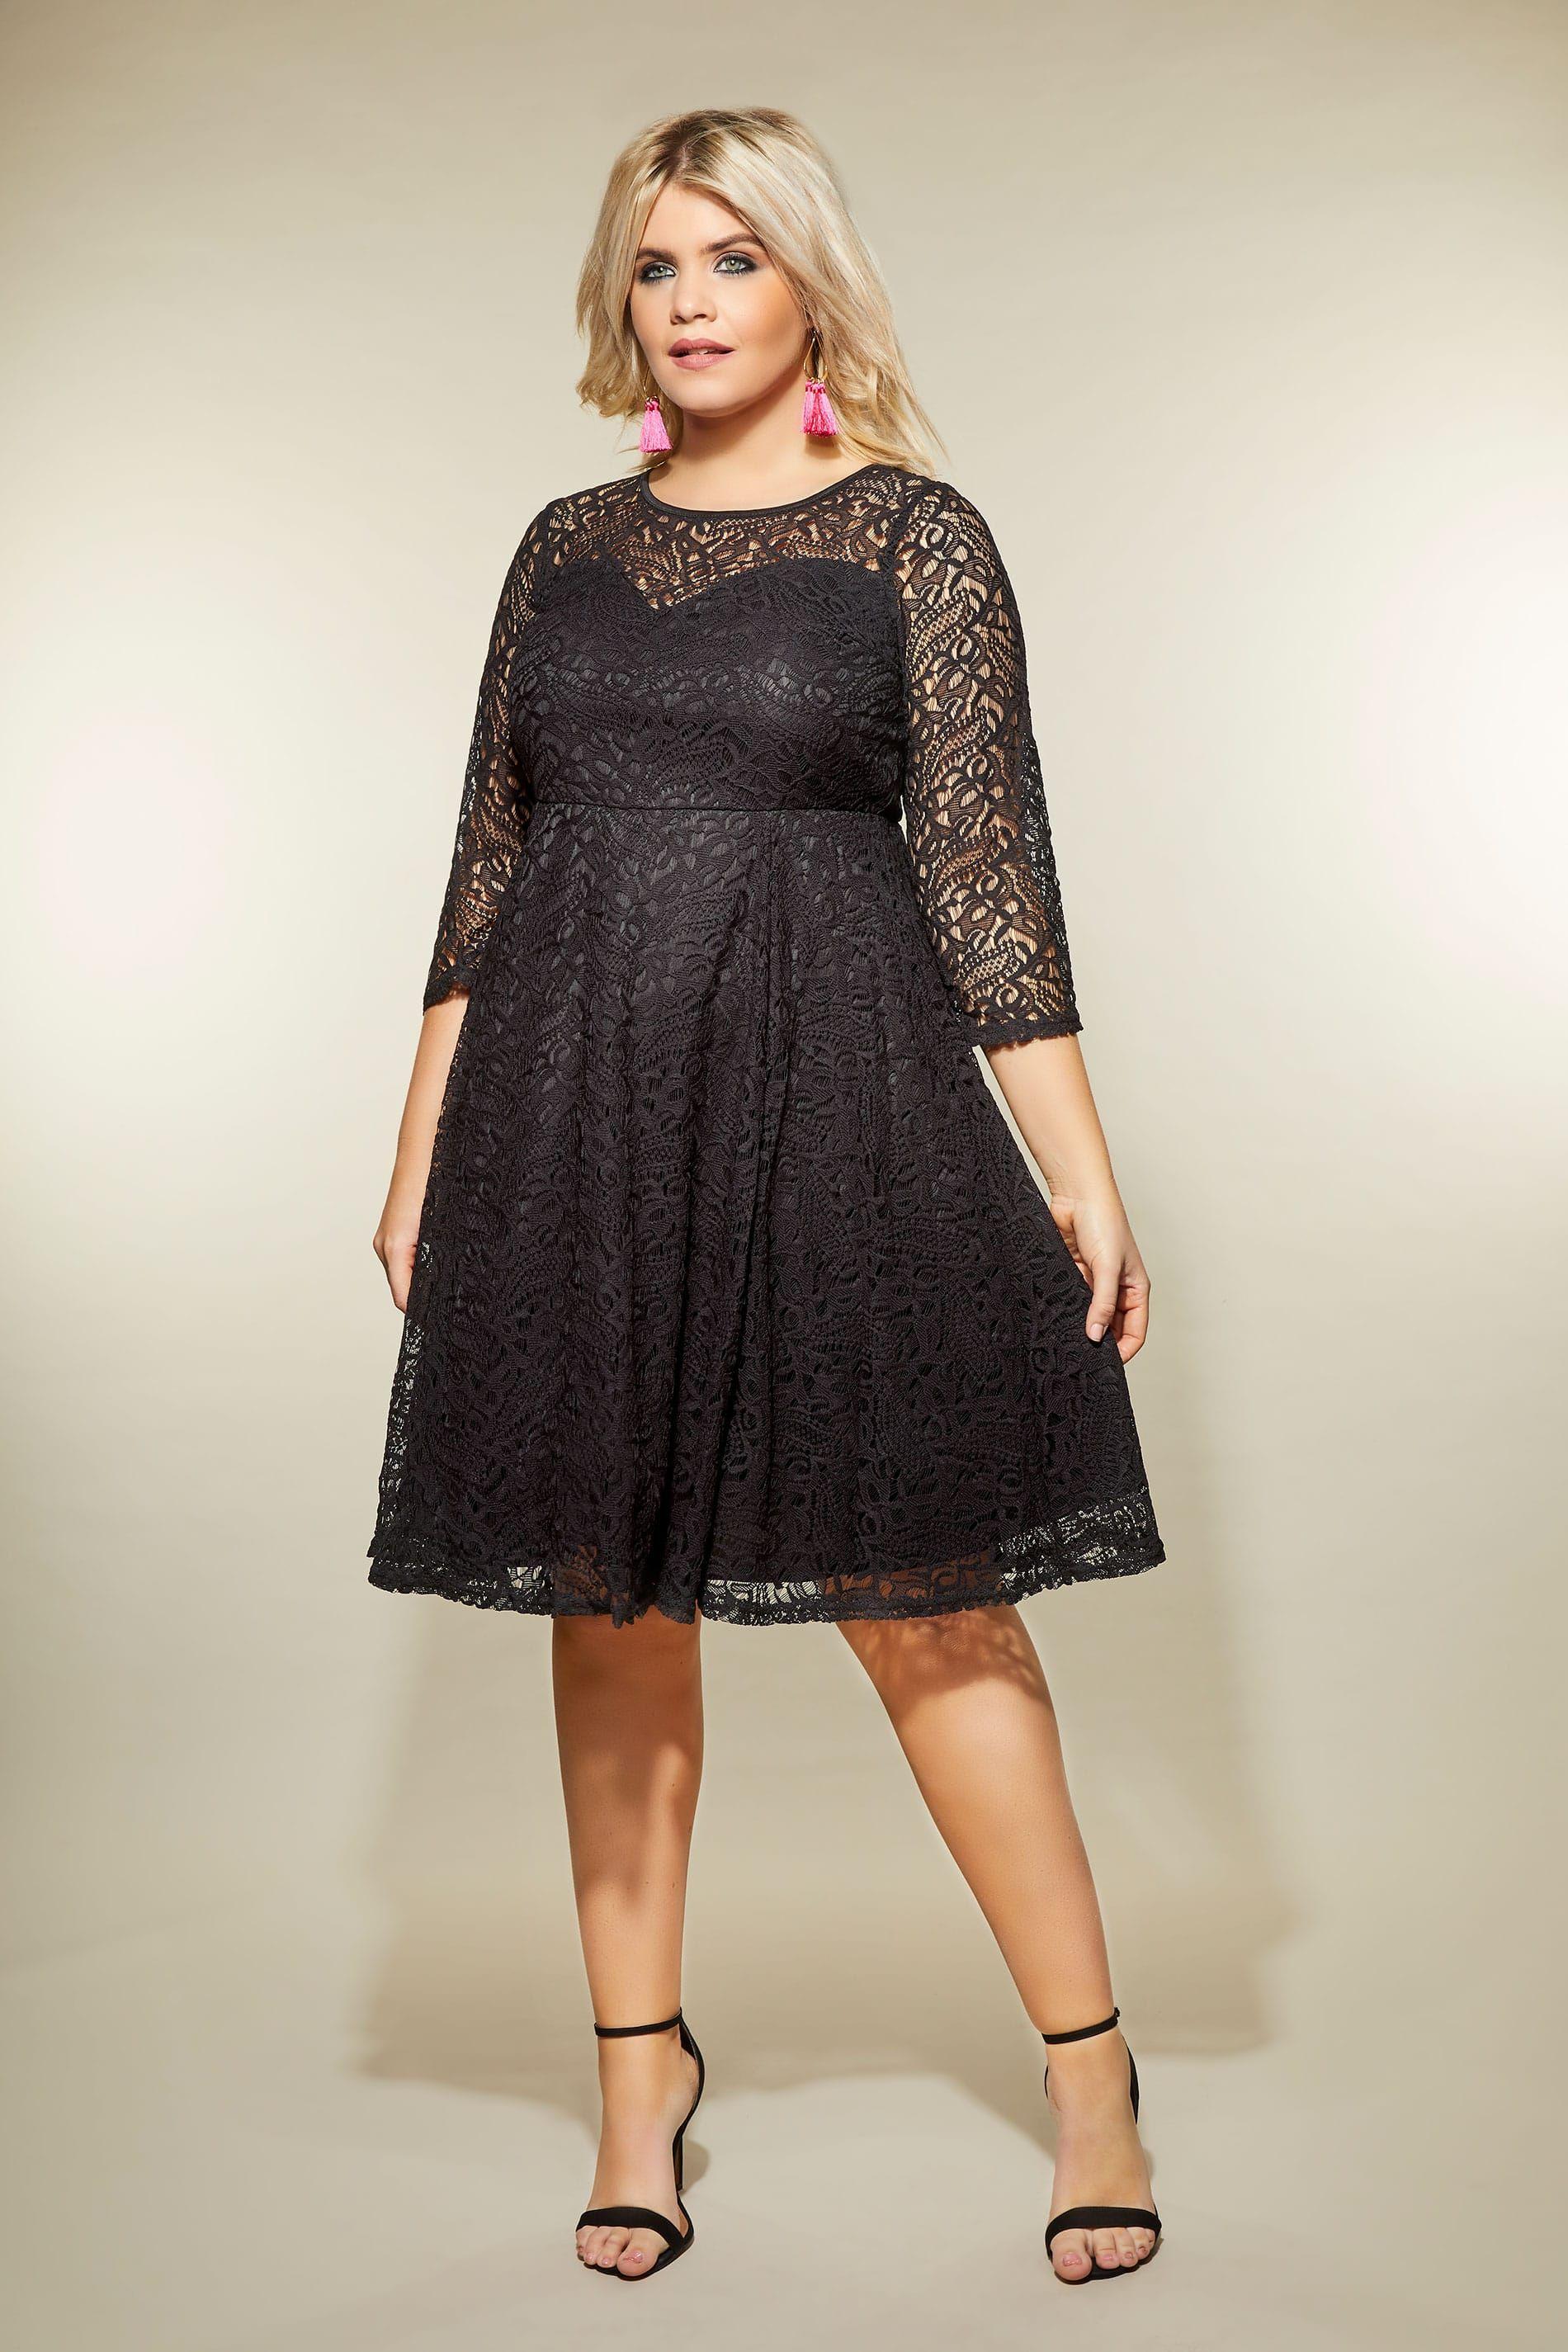 Black Lace Skater Dress Plus Size 16 To 36 Plus Size Lace Dress Plus Size Skater Dress Lace Skater Dress [ 2850 x 1900 Pixel ]